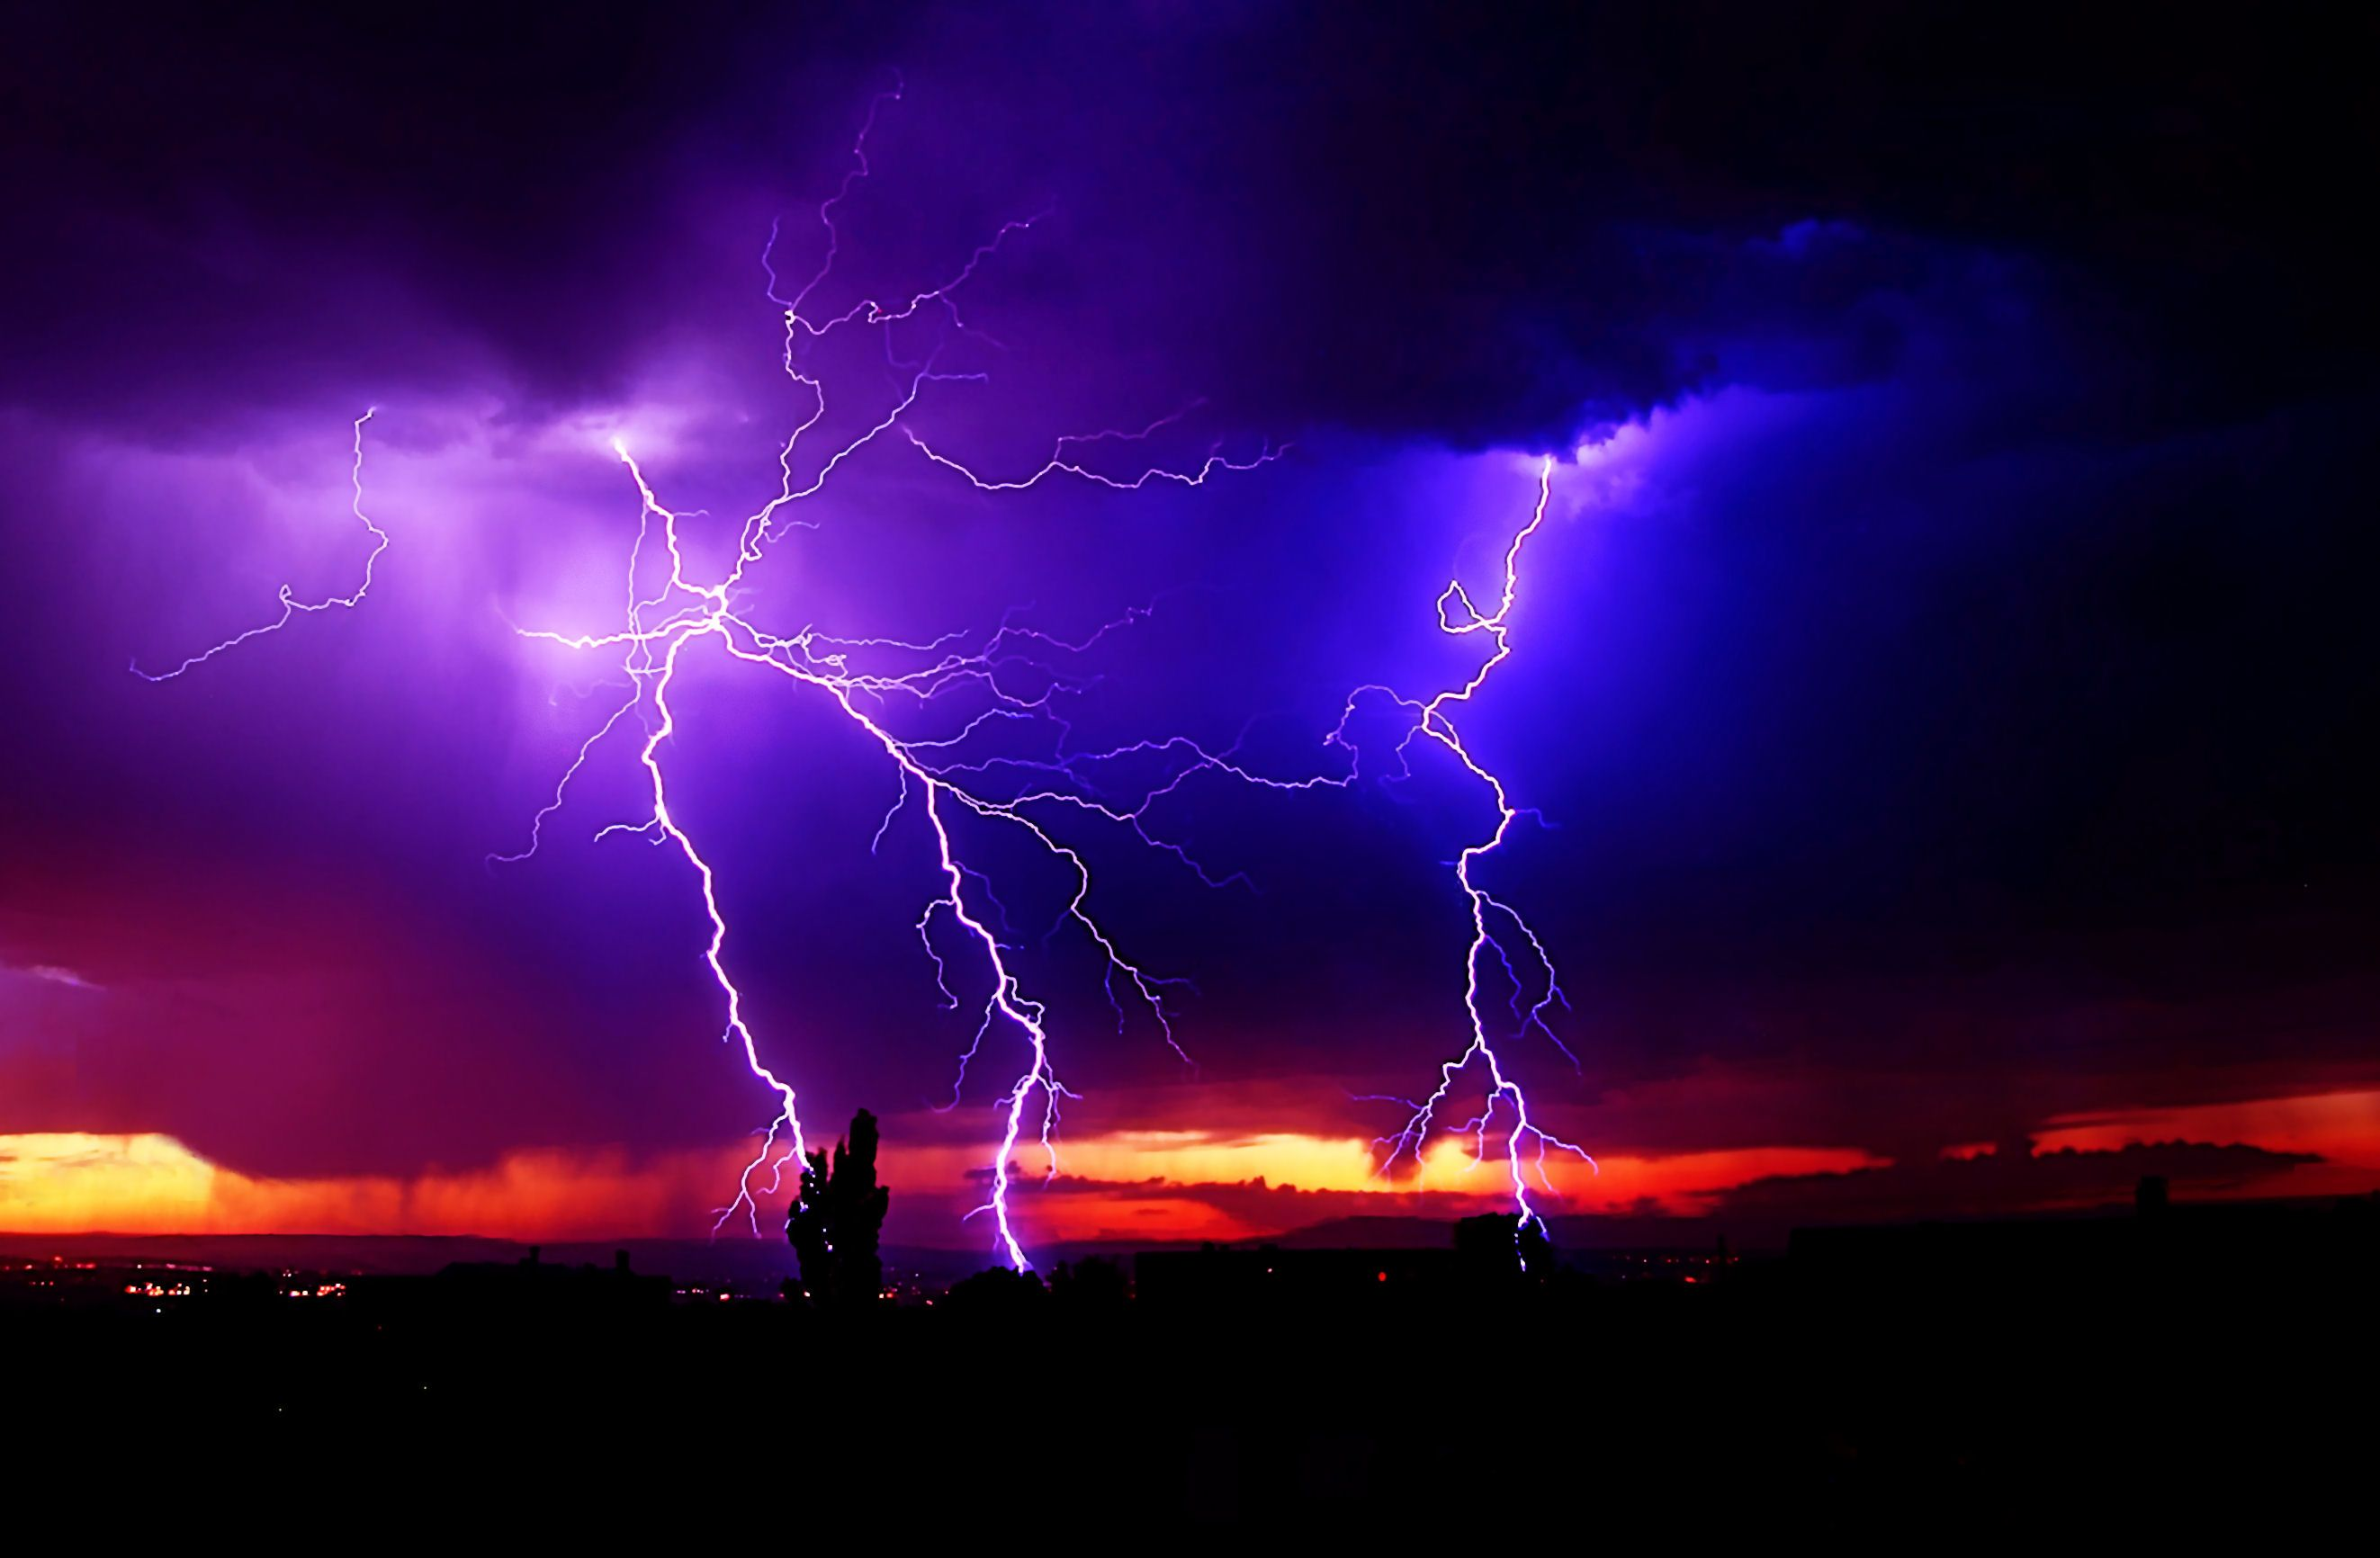 Lightning | Impressive Lightning Storms for your Desktop Wallpaper | Thomas Craig ...